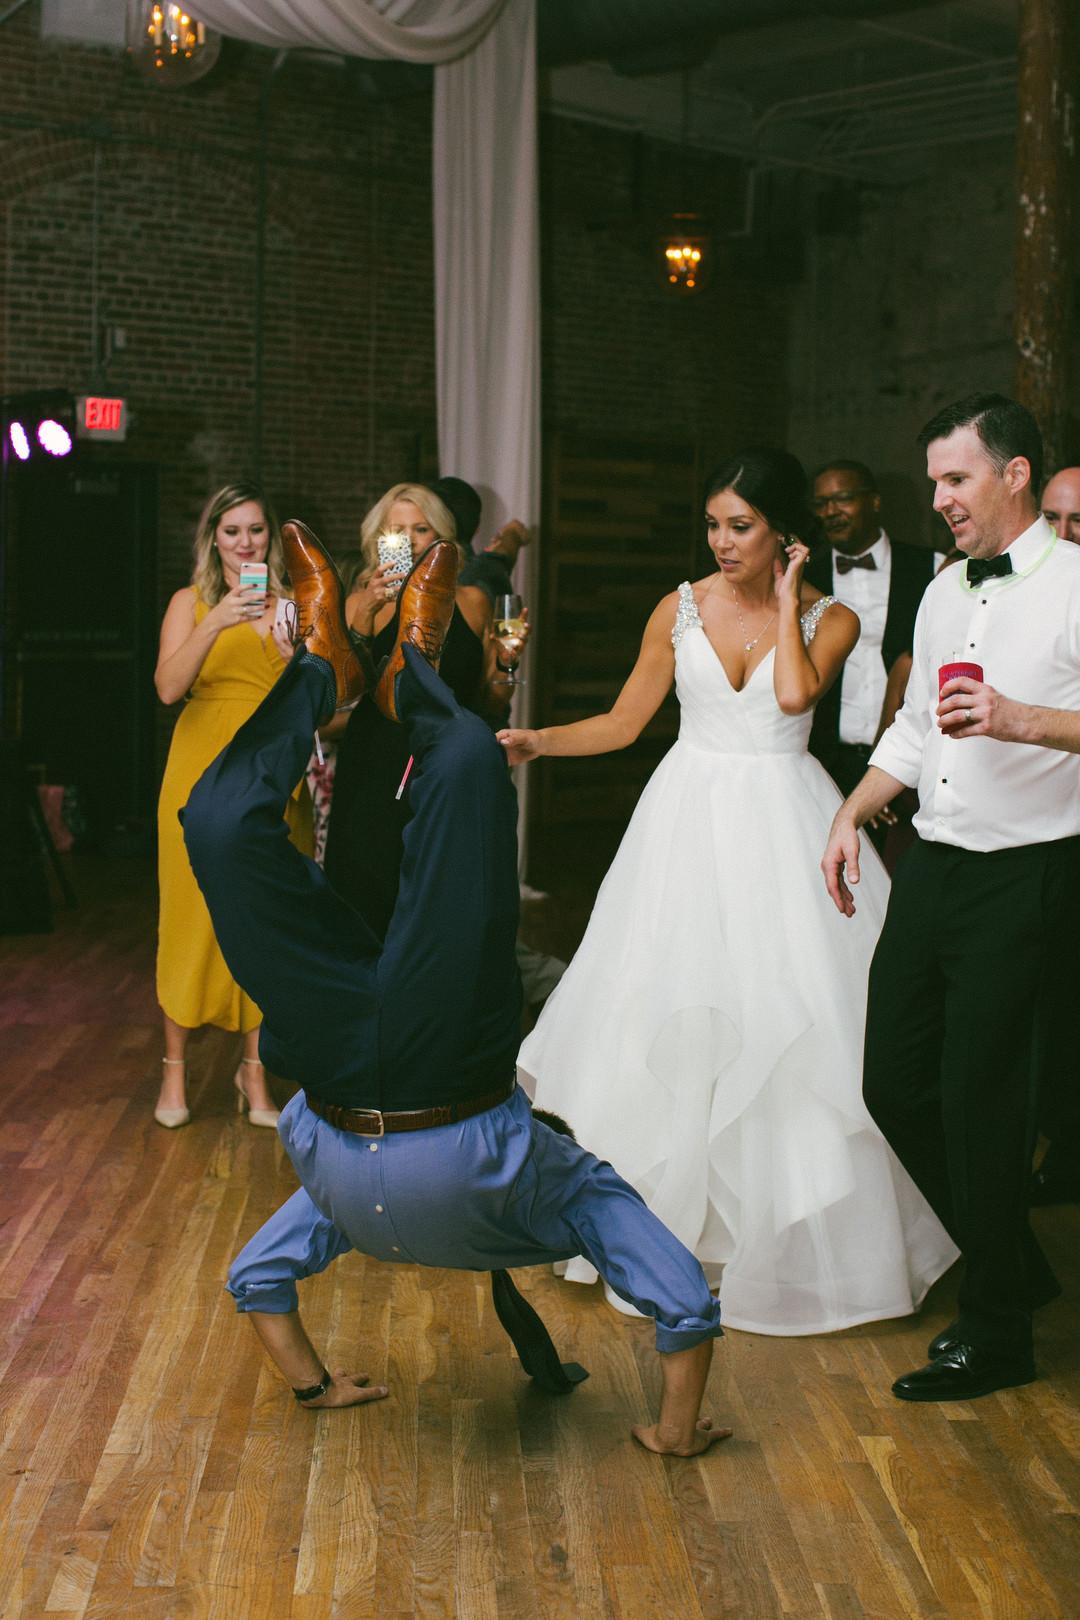 cedar-room-wedding-46.jpg